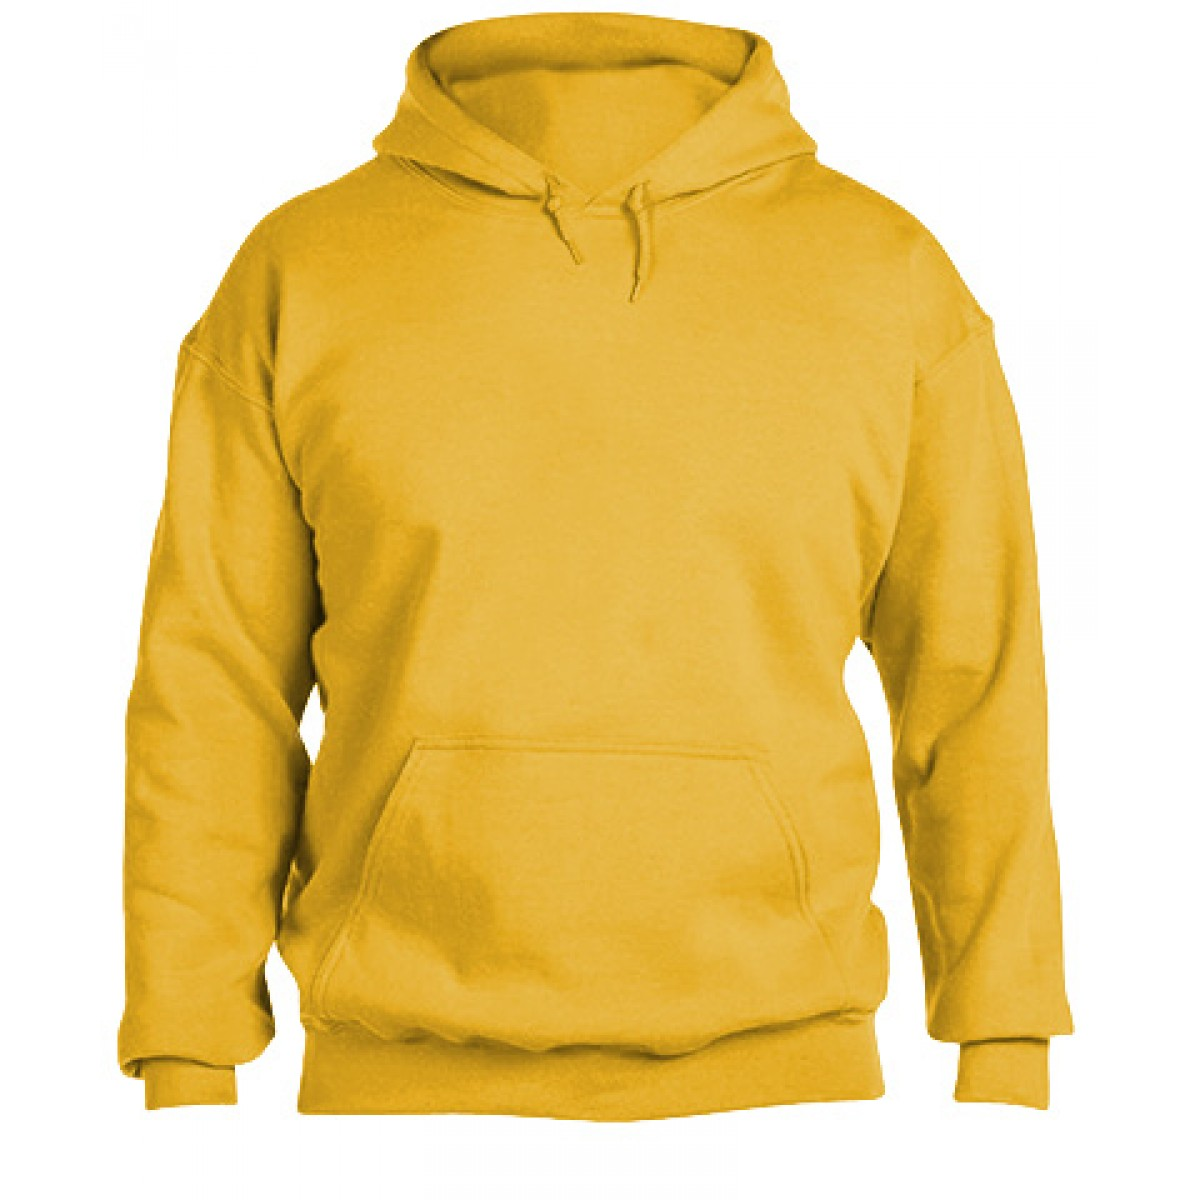 Hooded Sweatshirt 50/50 Heavy Blend -Gold-2XL